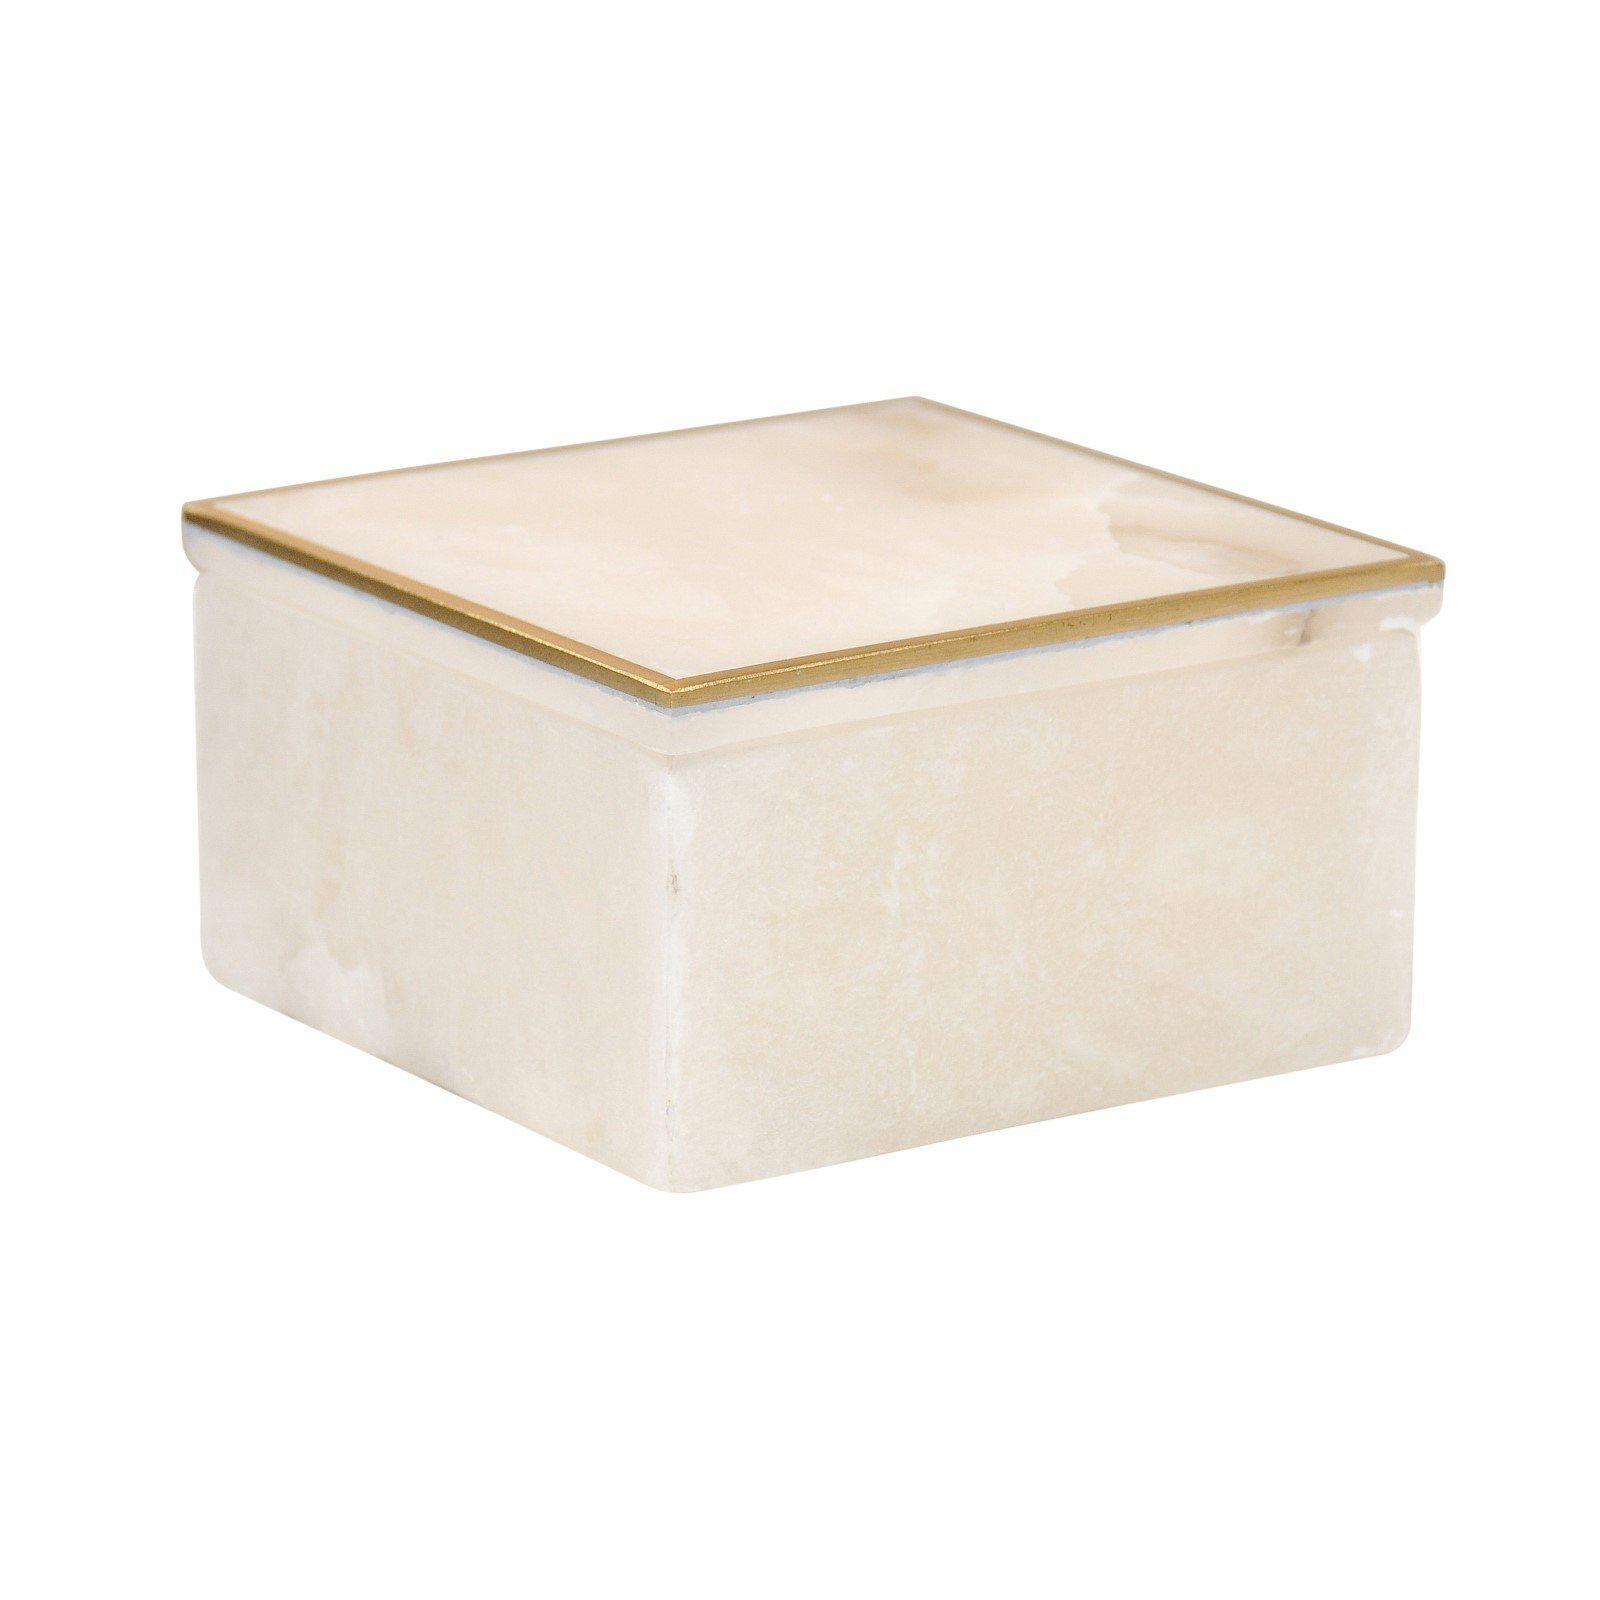 Alabaster Box Alabaster Box Box Decorative Boxes